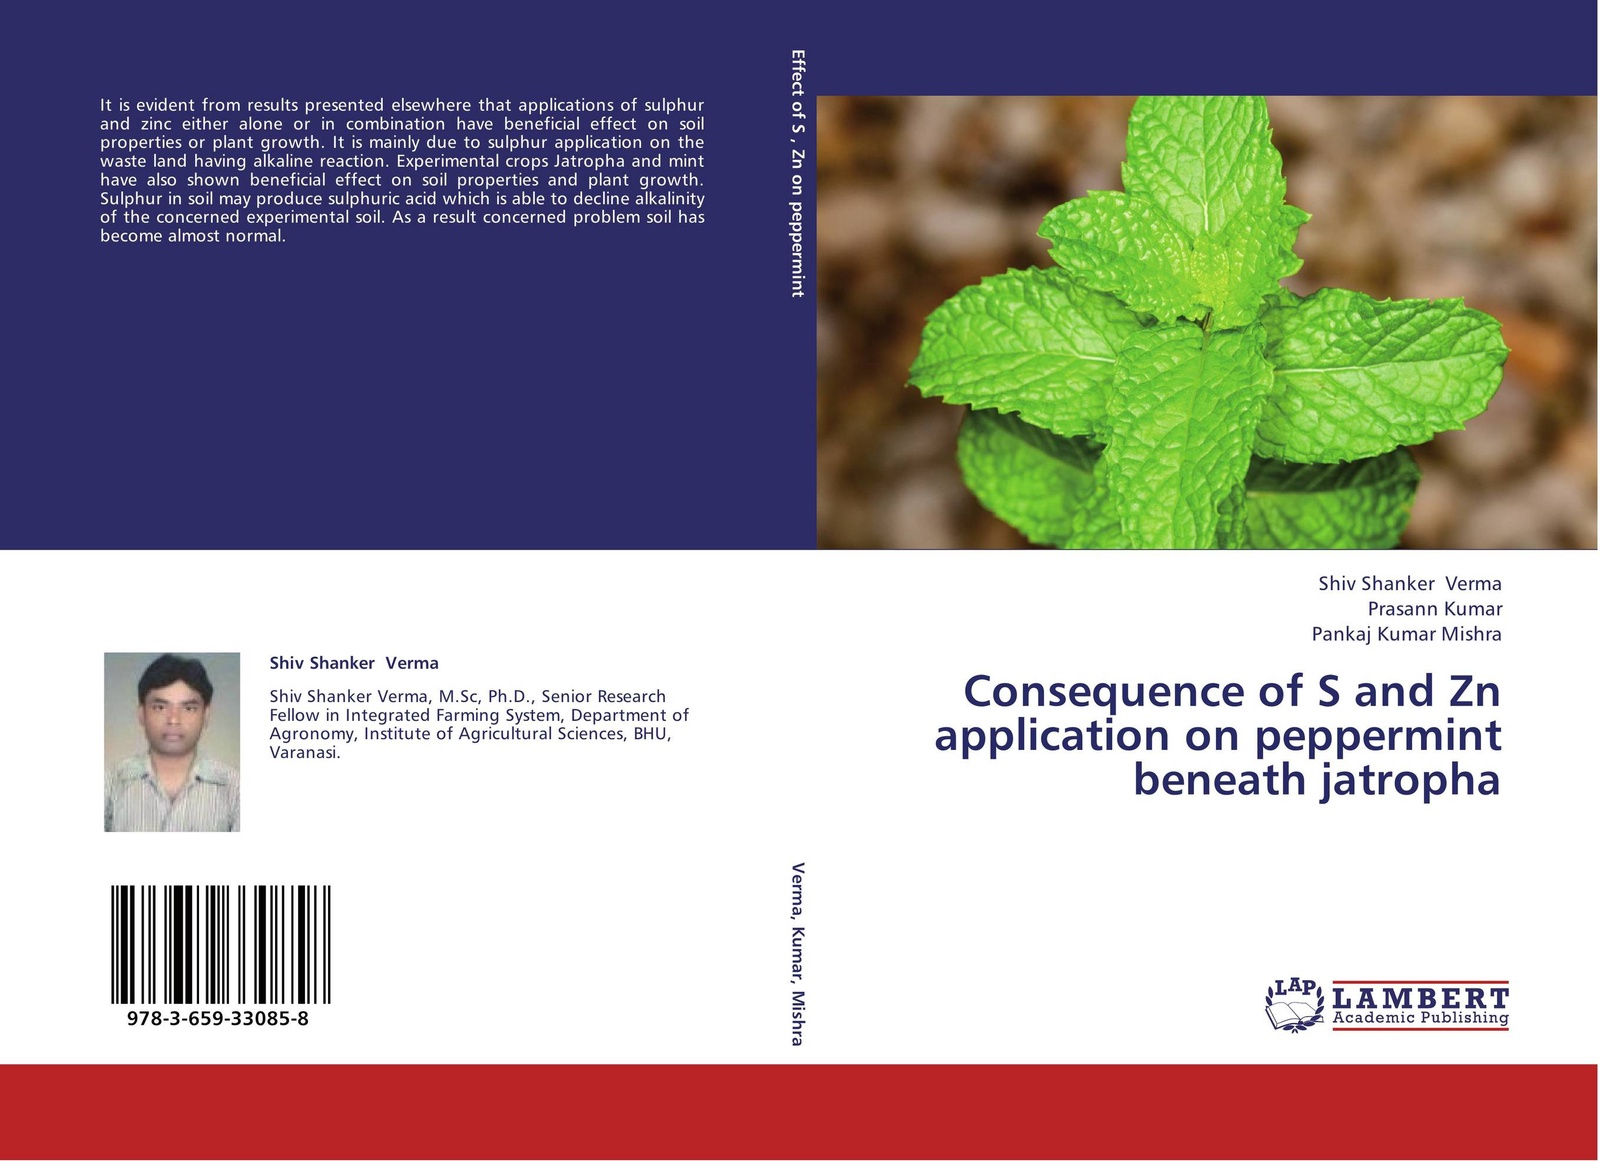 Shiv Shanker Verma,Prasann Kumar and Pankaj Kumar Mishra Consequence of S and Zn application on peppermint beneath jatropha недорого